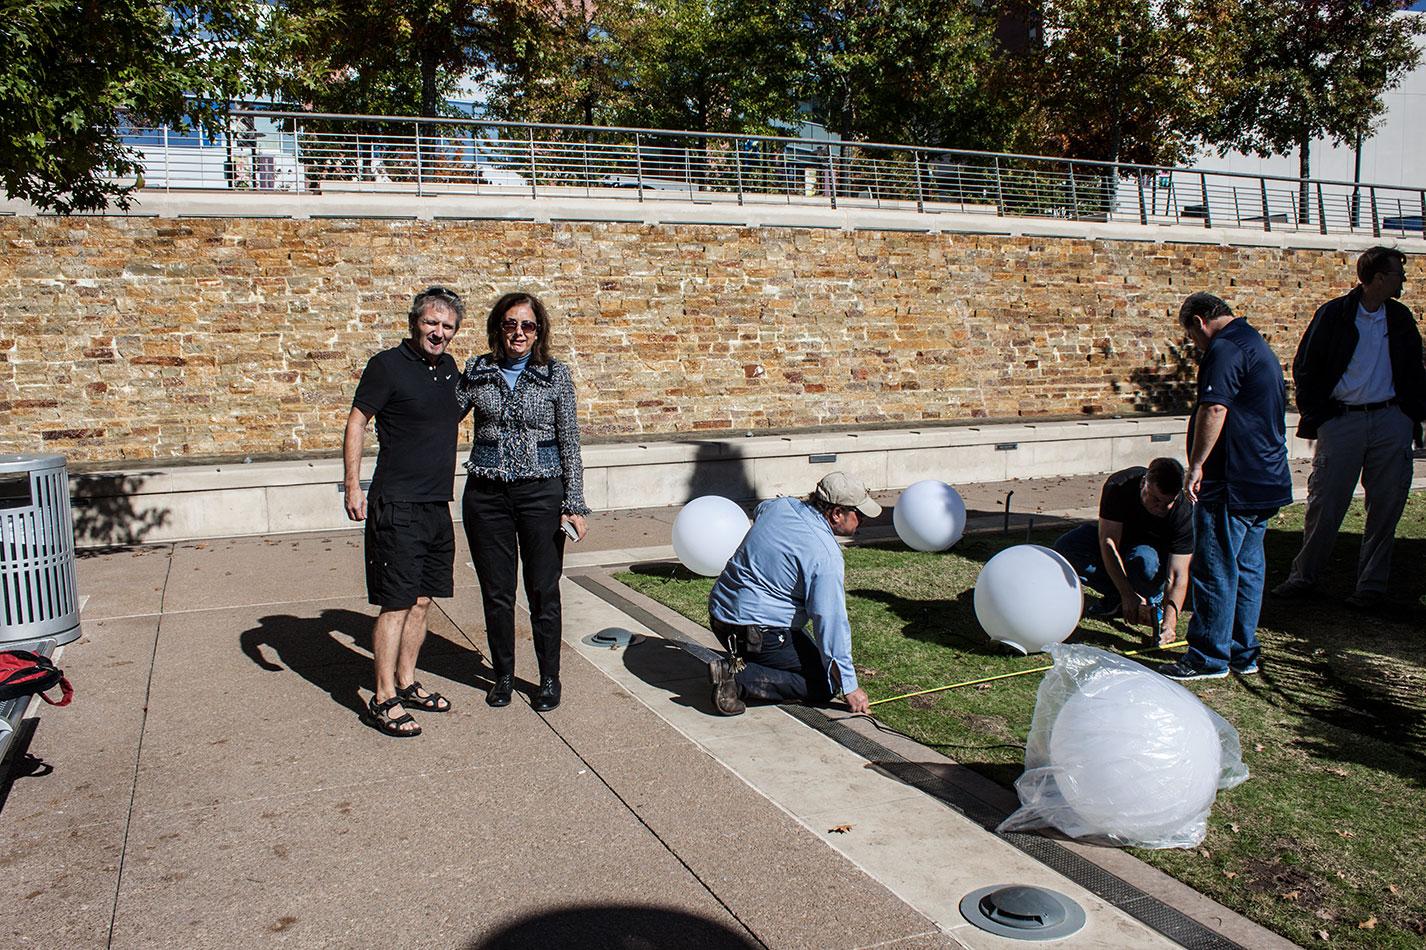 public-art-usa-houston-woodlands-texas-art-arts-arte-design-light-balls-bench-manfred-kielnhofer-contemporary-fine--light-art-design-architecture-sculpture-5290